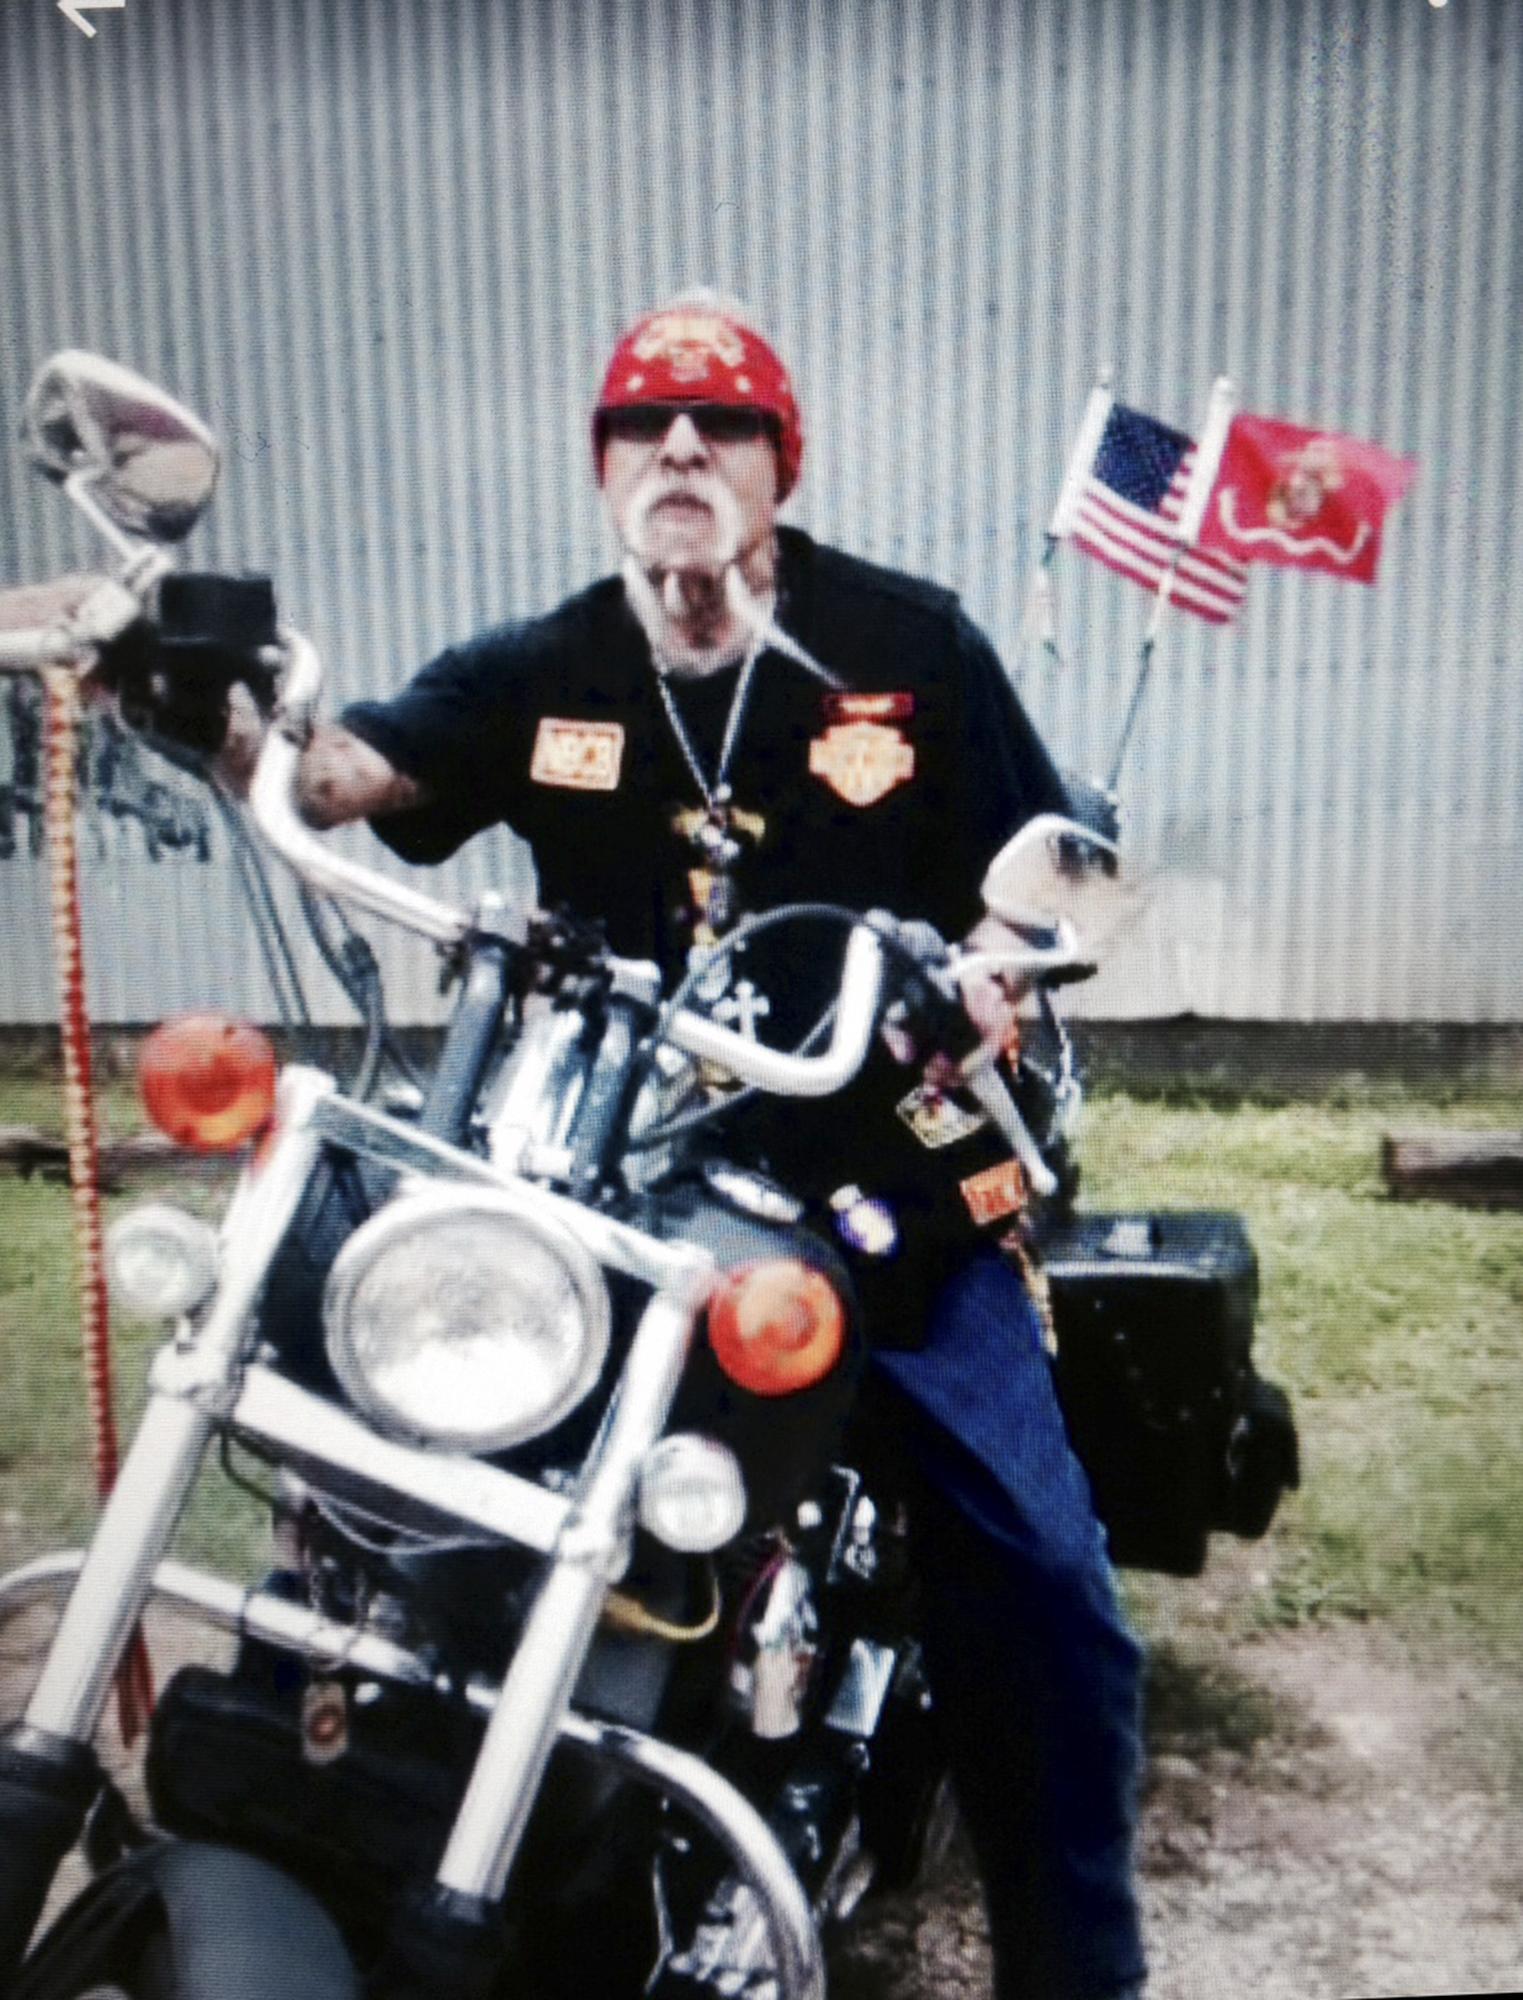 New Braunfels Man Killed In Waco Shooting Enjoyed